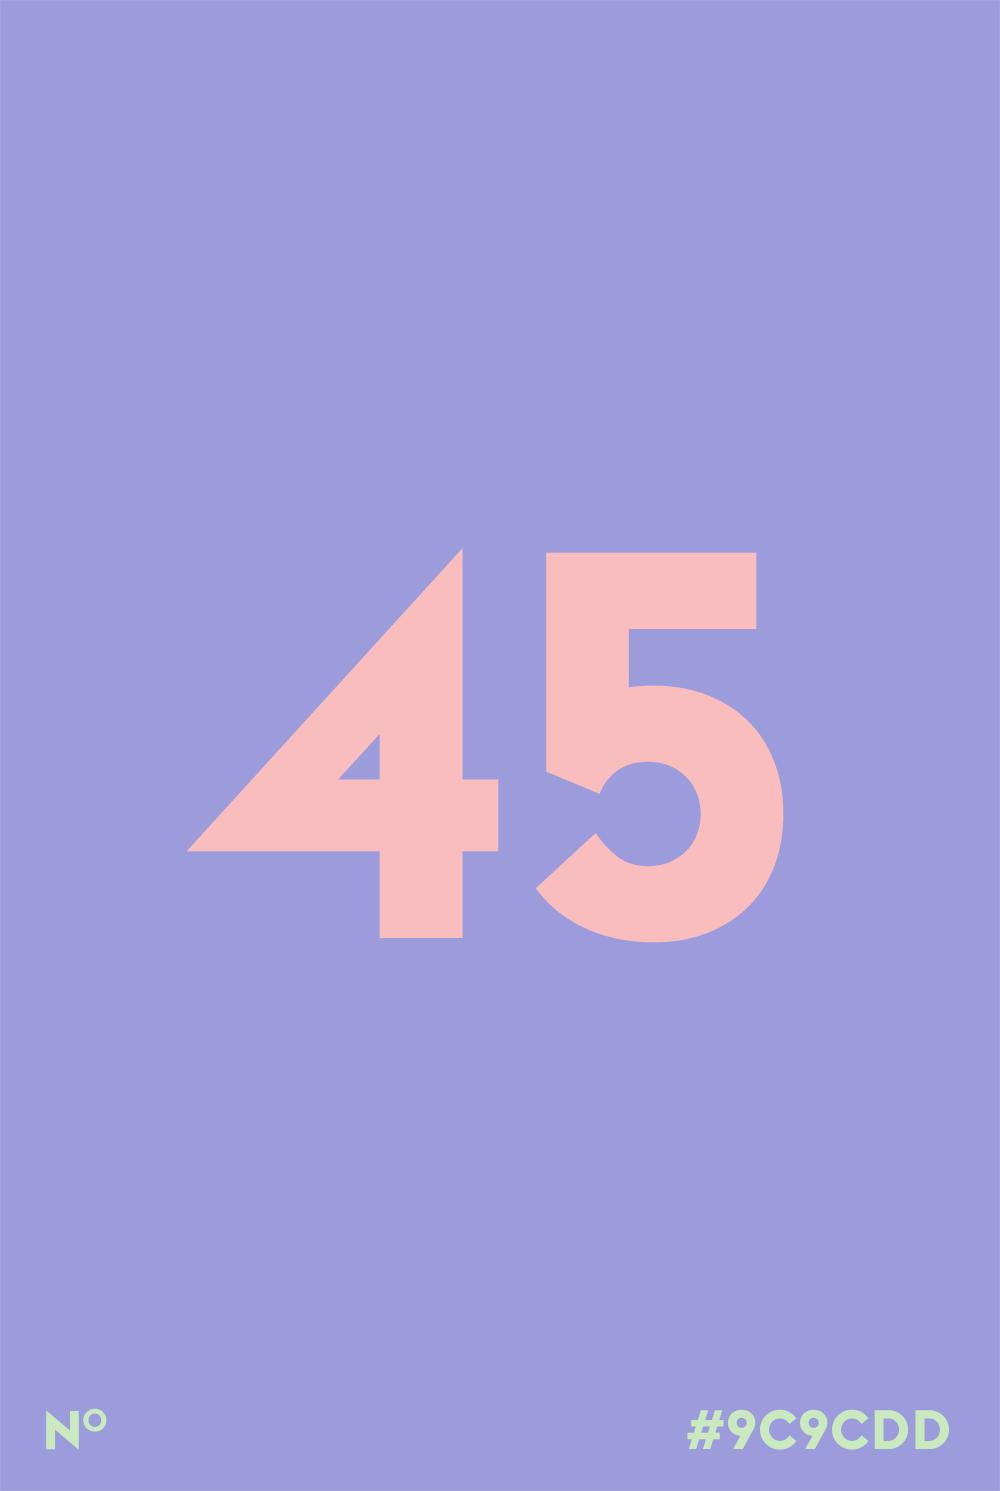 cc_0044_45